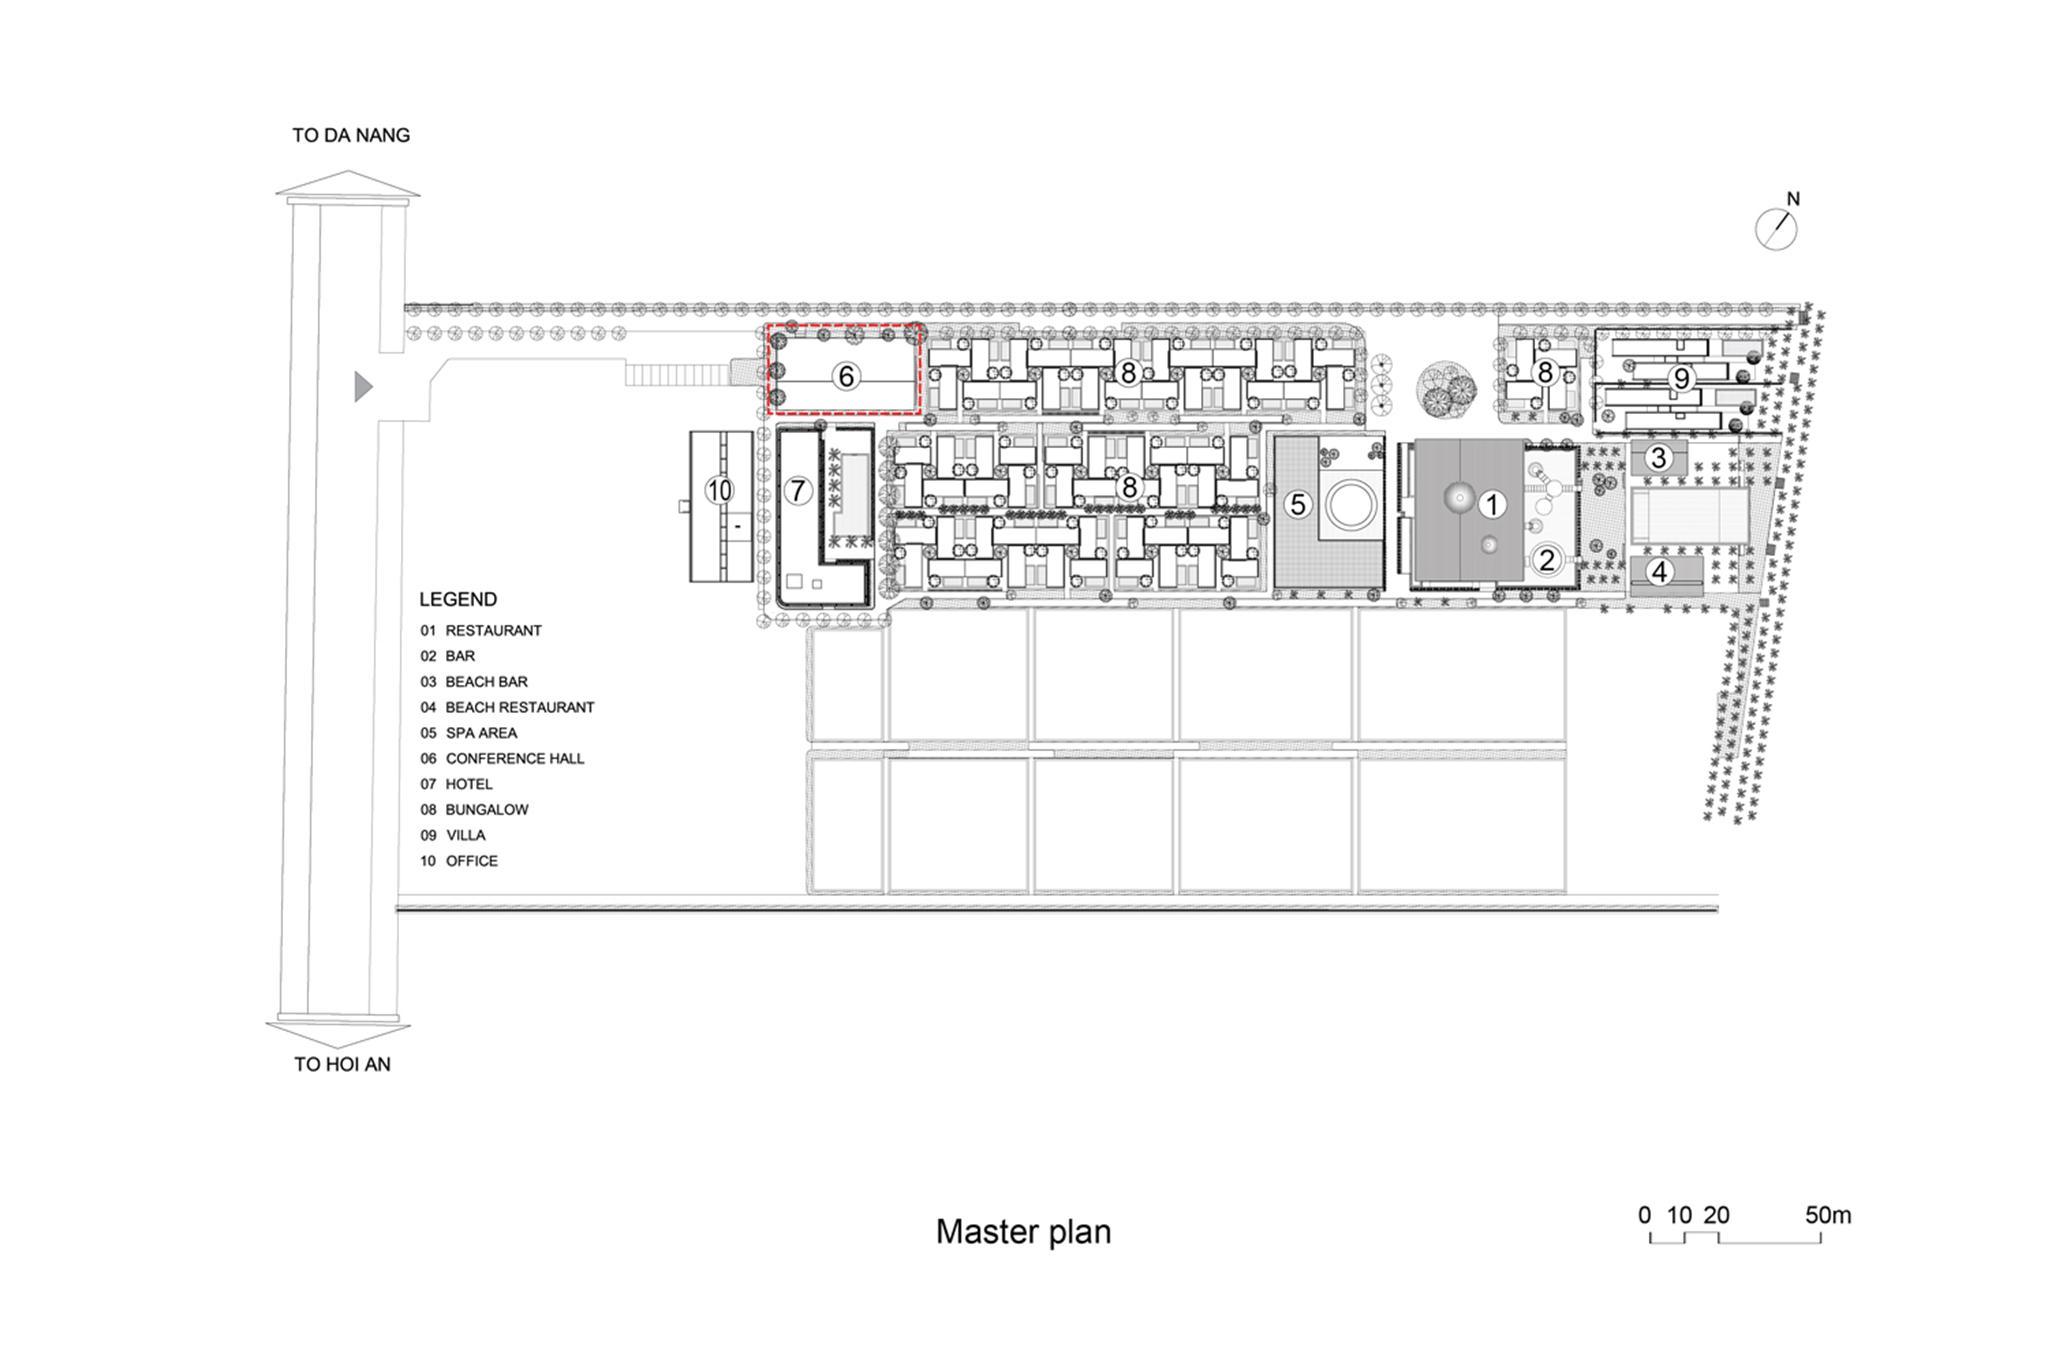 dwg1_Master plan (Copy)